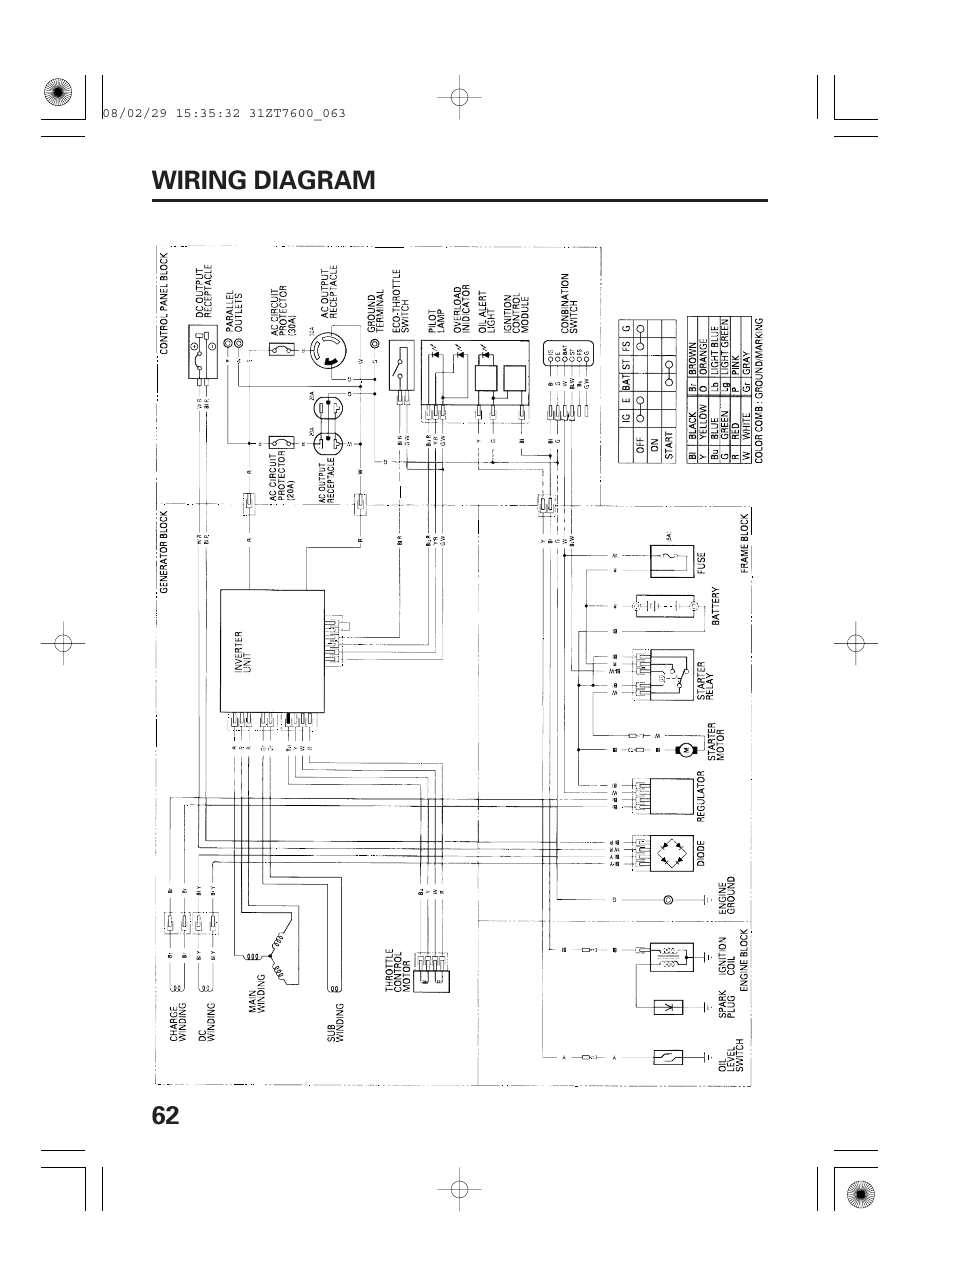 medium resolution of wiring diagram 62 wiring diagram honda eu3000is user manualwiring diagram 62 wiring diagram honda